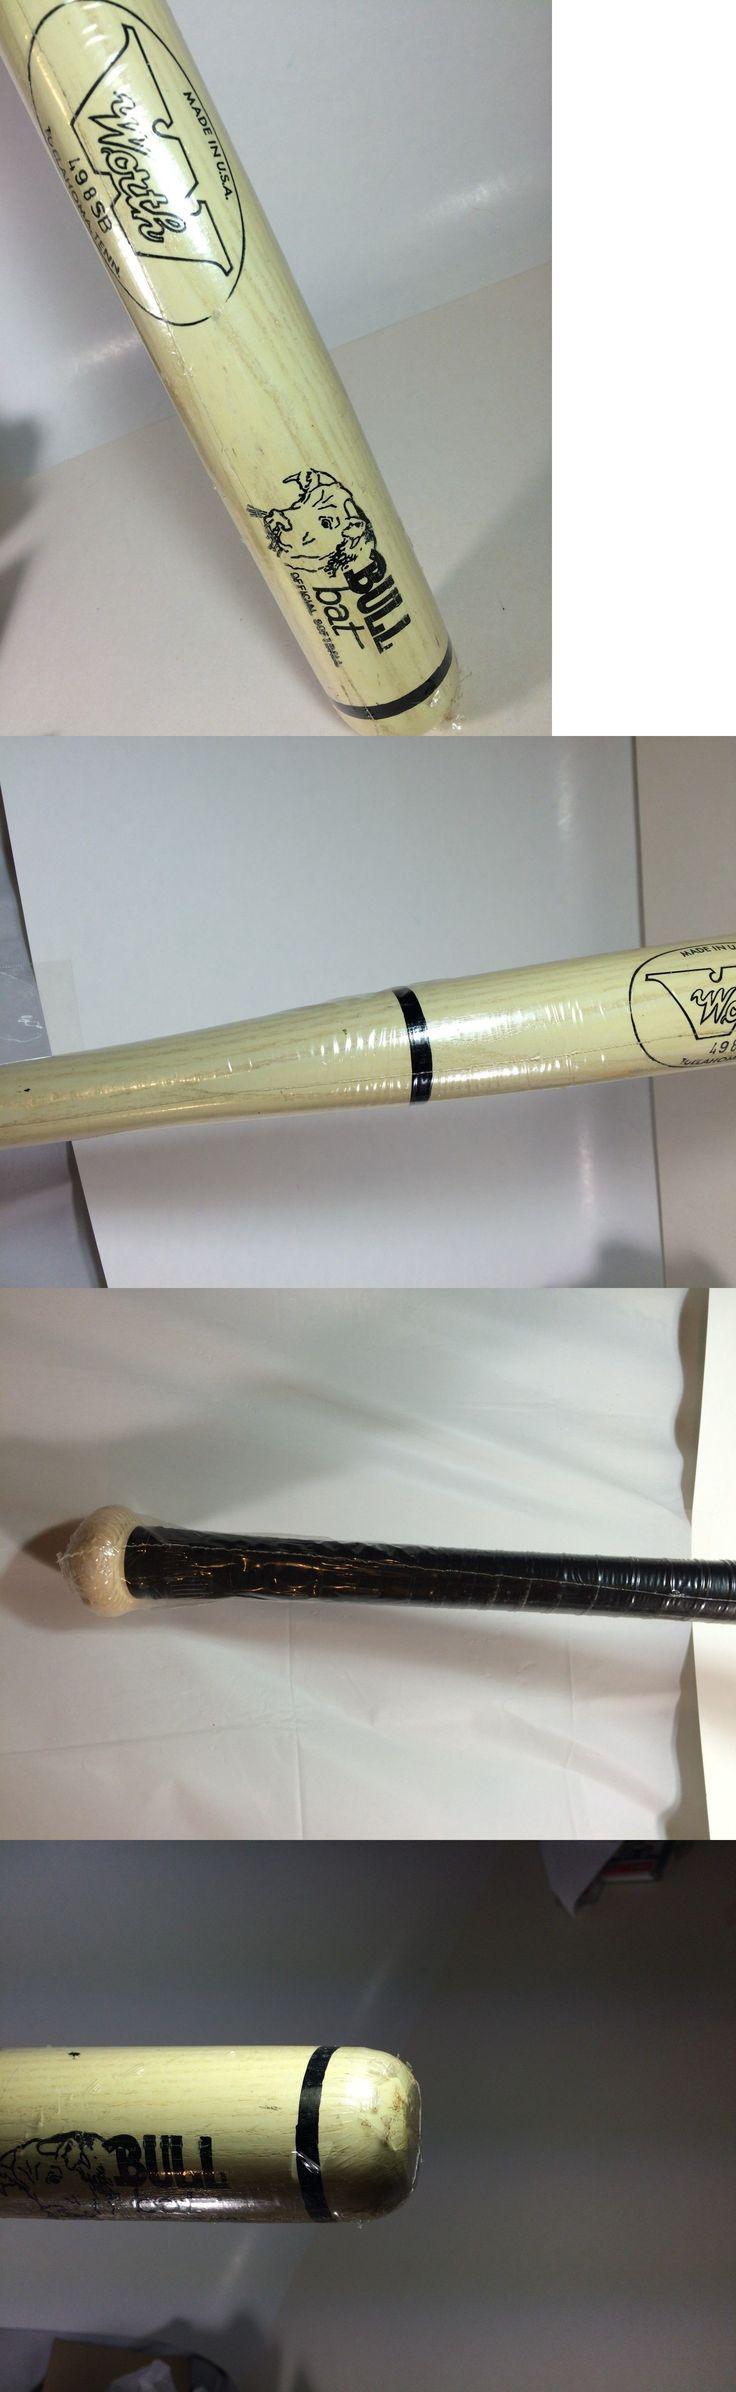 Other Baseball and Softball Bats 181316: Worth Wooden #498 Sb Wood Softball Bull Bat Marked #4 Nip 34 Long -> BUY IT NOW ONLY: $67.99 on eBay!